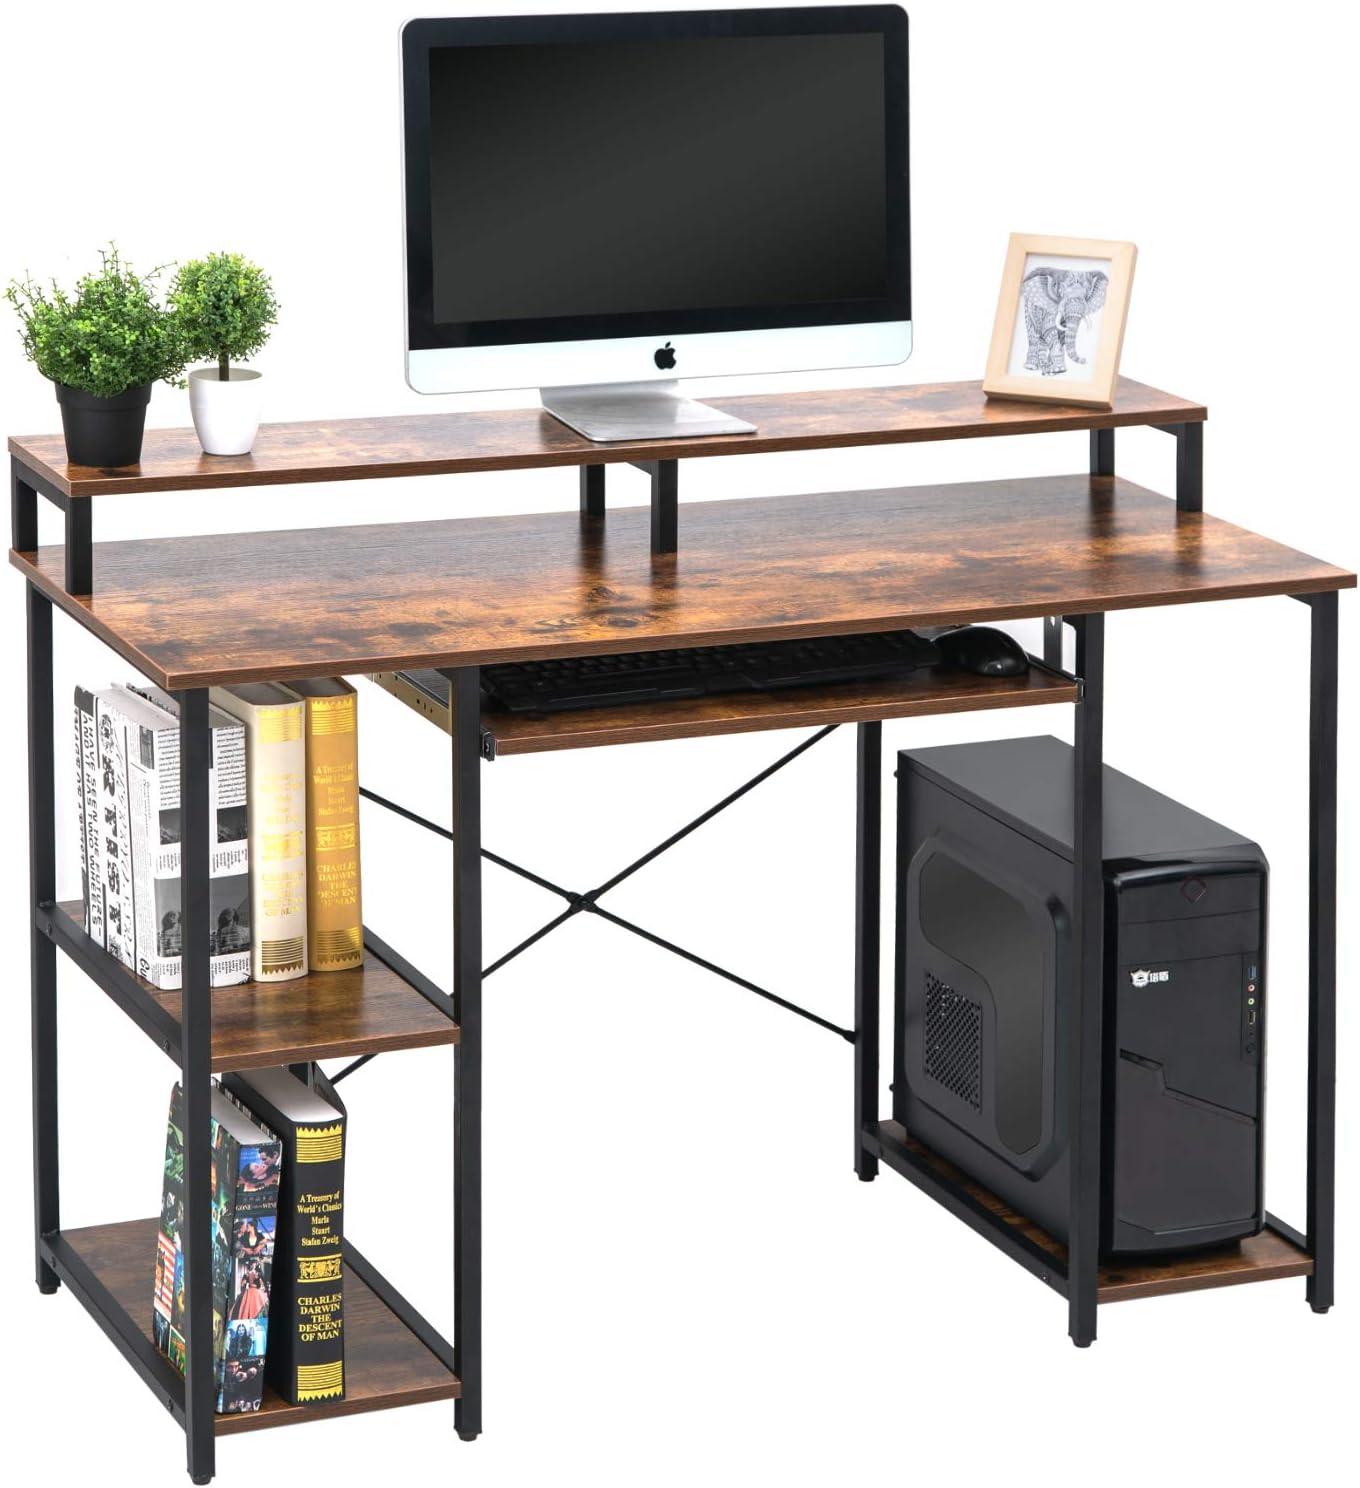 - Amazon.com: TOPSKY Computer Desk With Storage Shelves/Keyboard